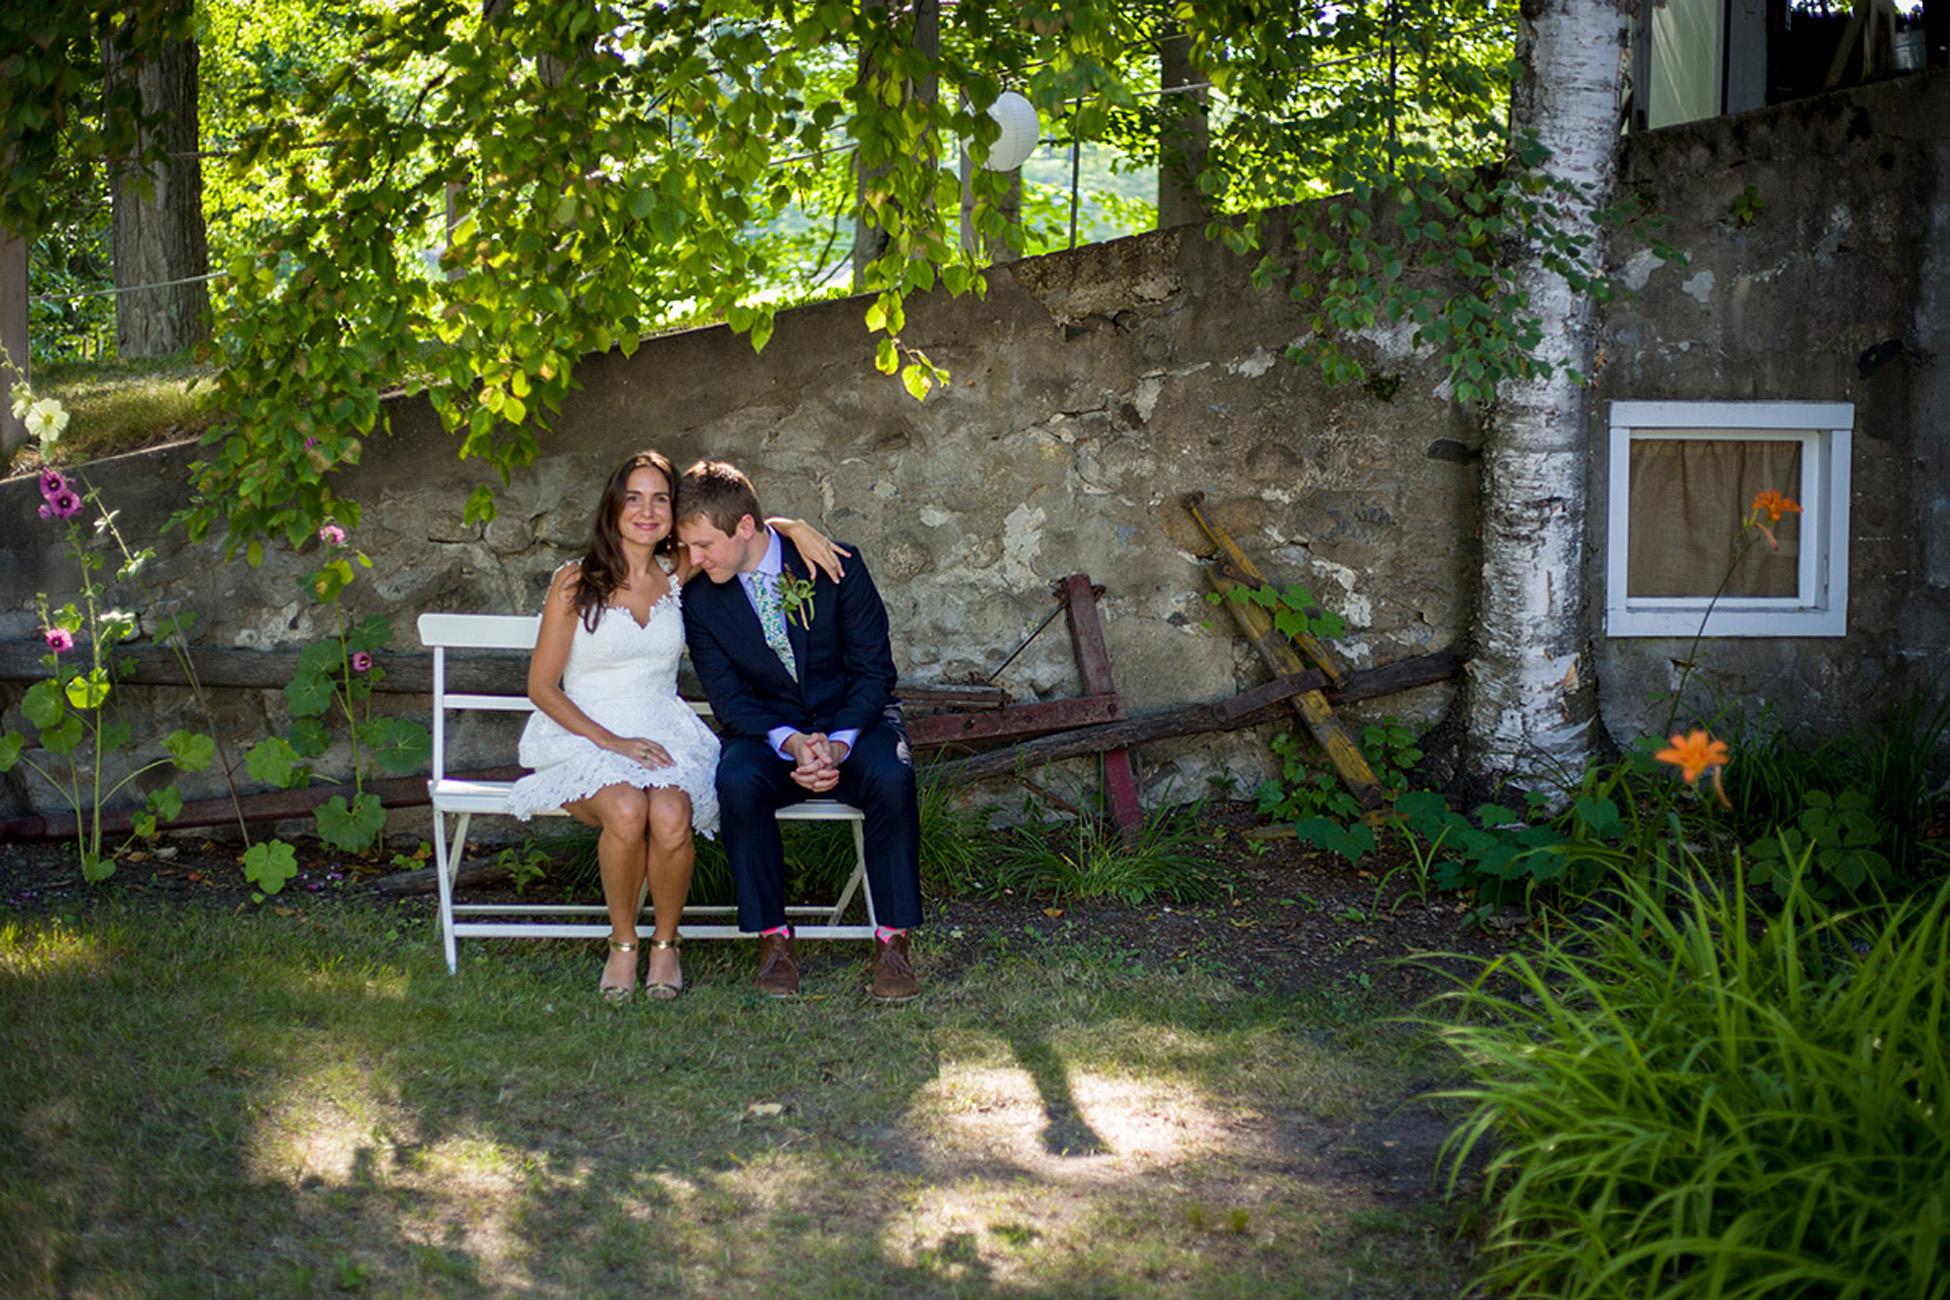 A Wedding at Cherry Basket Farm by Photographer Thomas Kachadurian